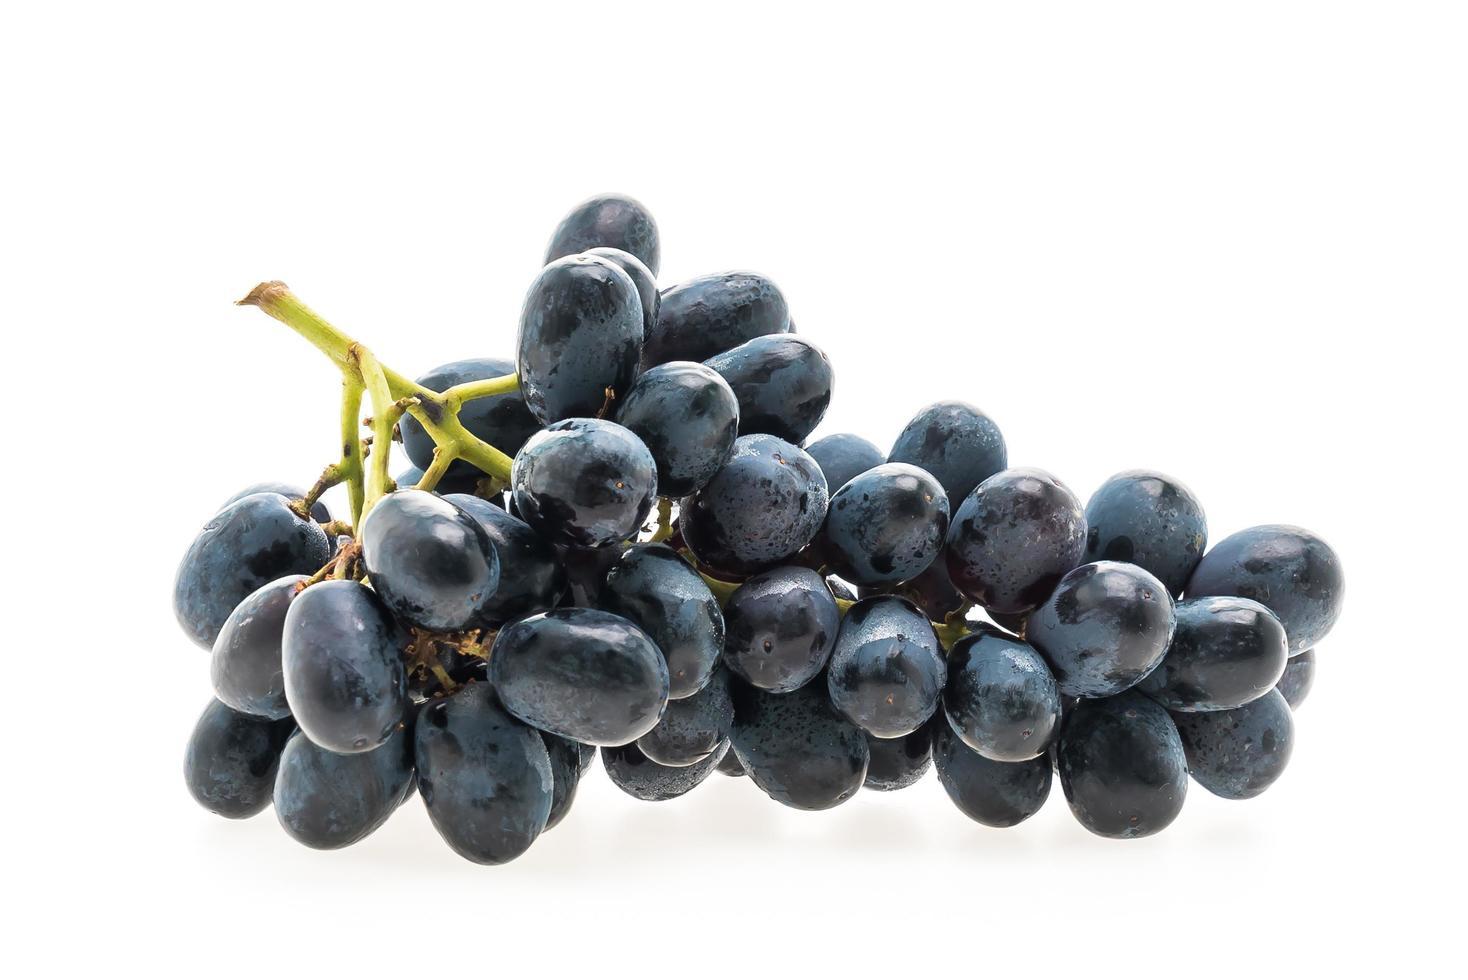 Fruta de uvas aislado sobre fondo blanco. foto